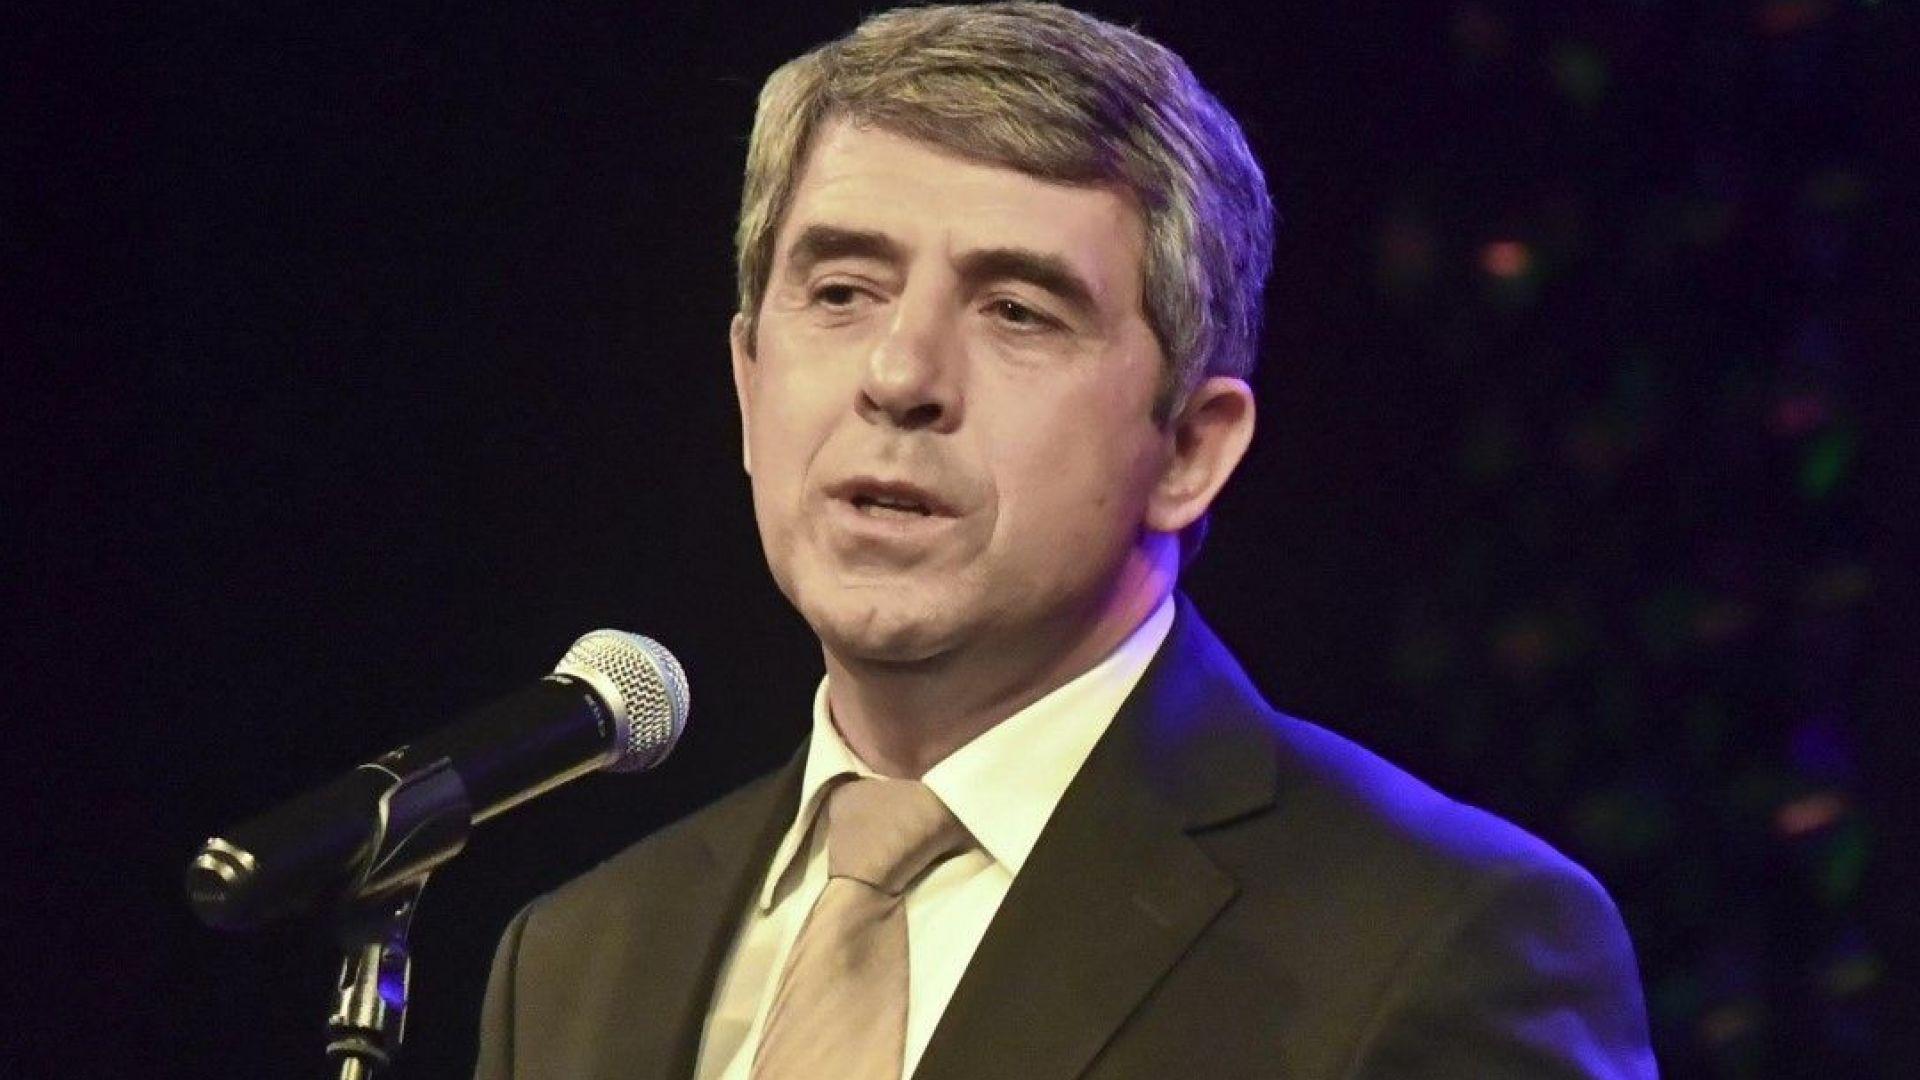 Плевнелиев: Кибератаката на изборите у нас през 2015 г. е дело на Fancy Bears